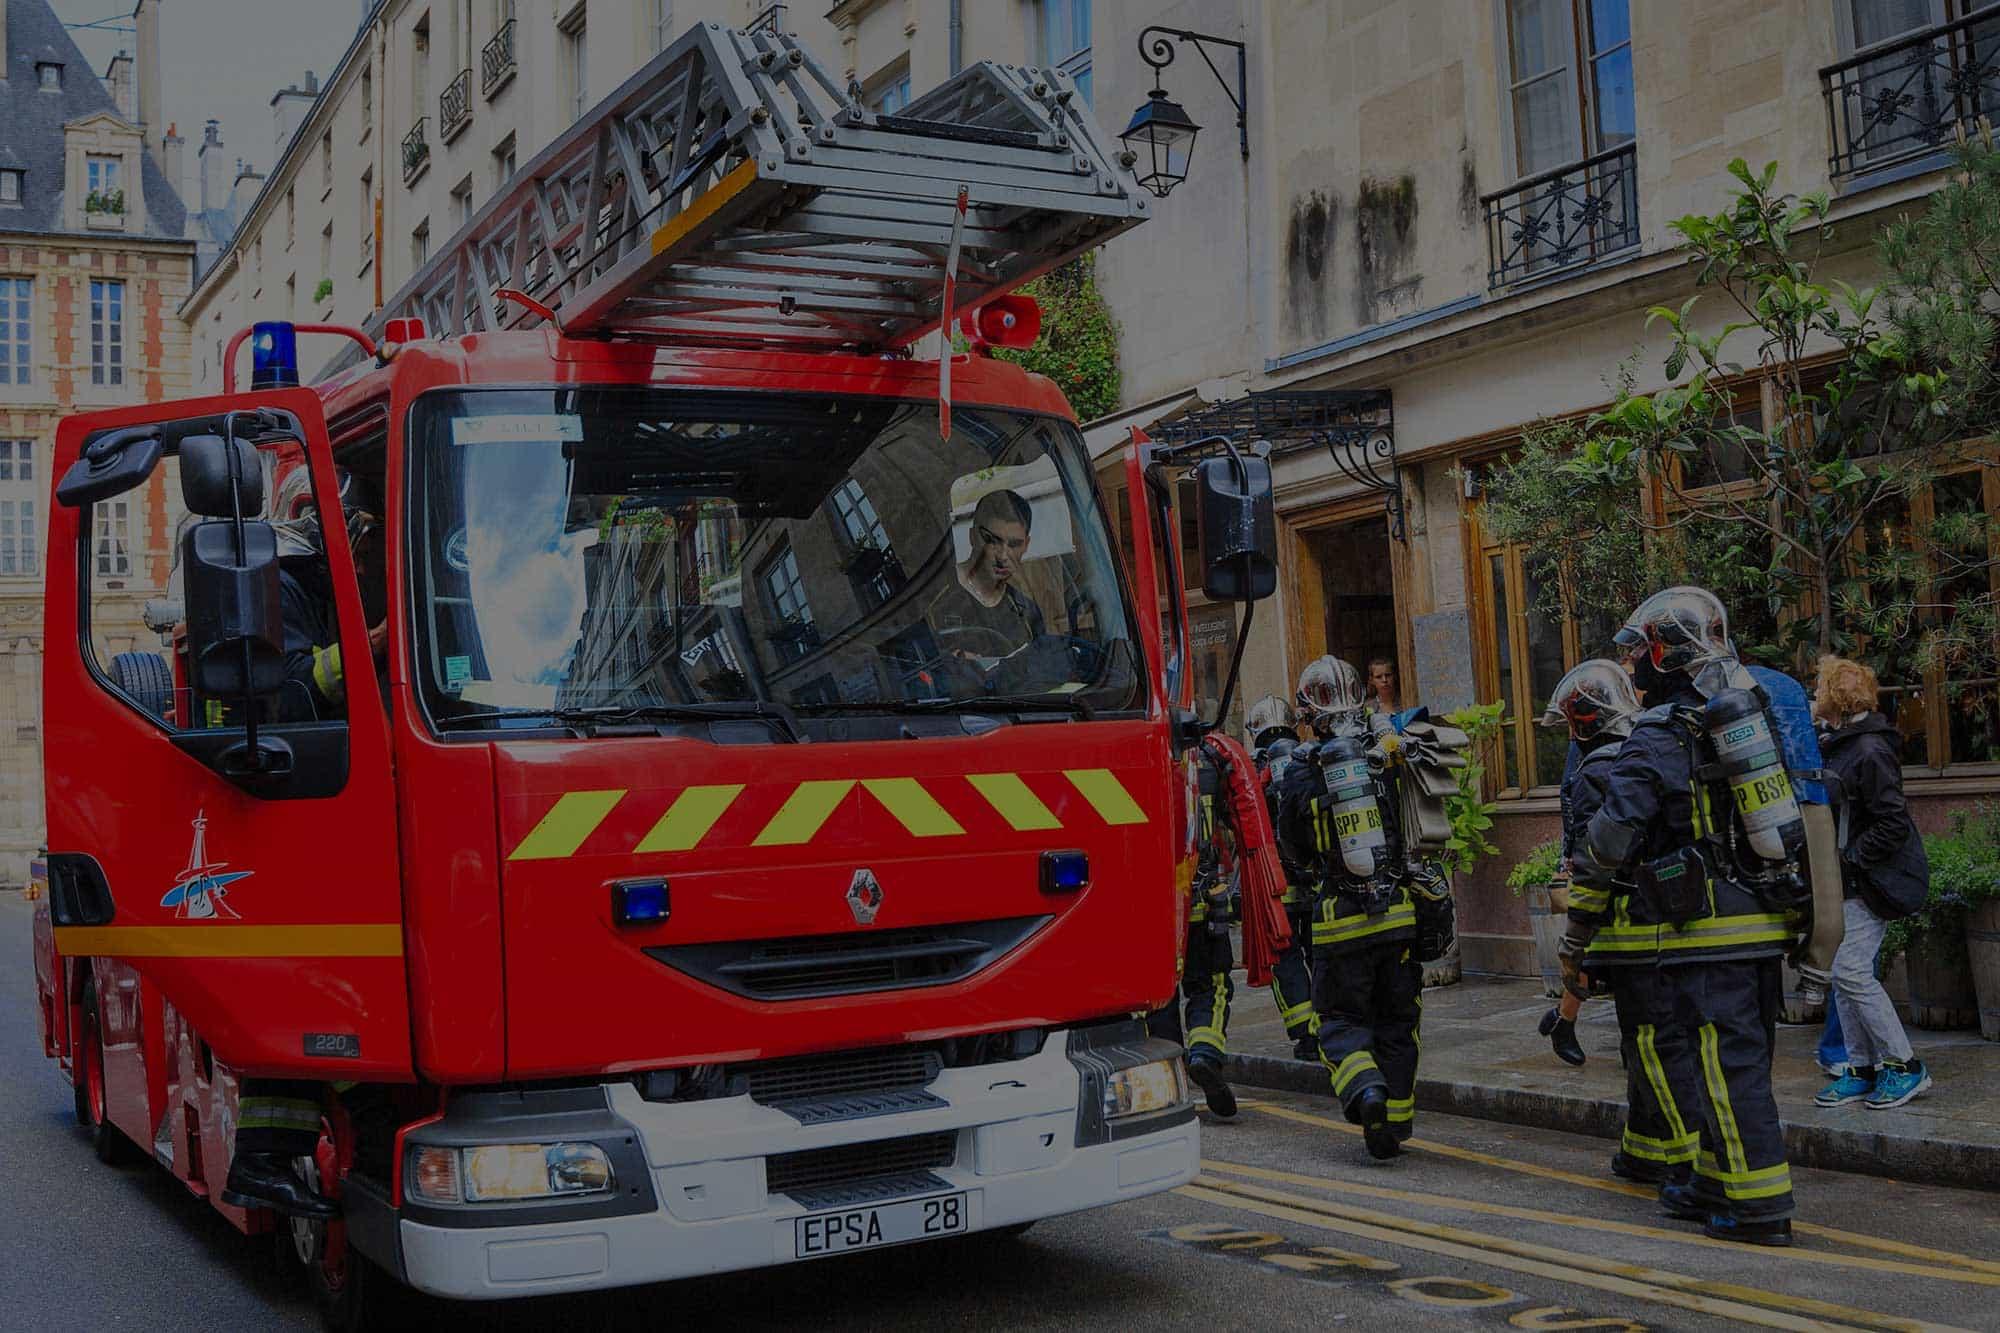 pfi-entreprise-protection-incendie-slide03